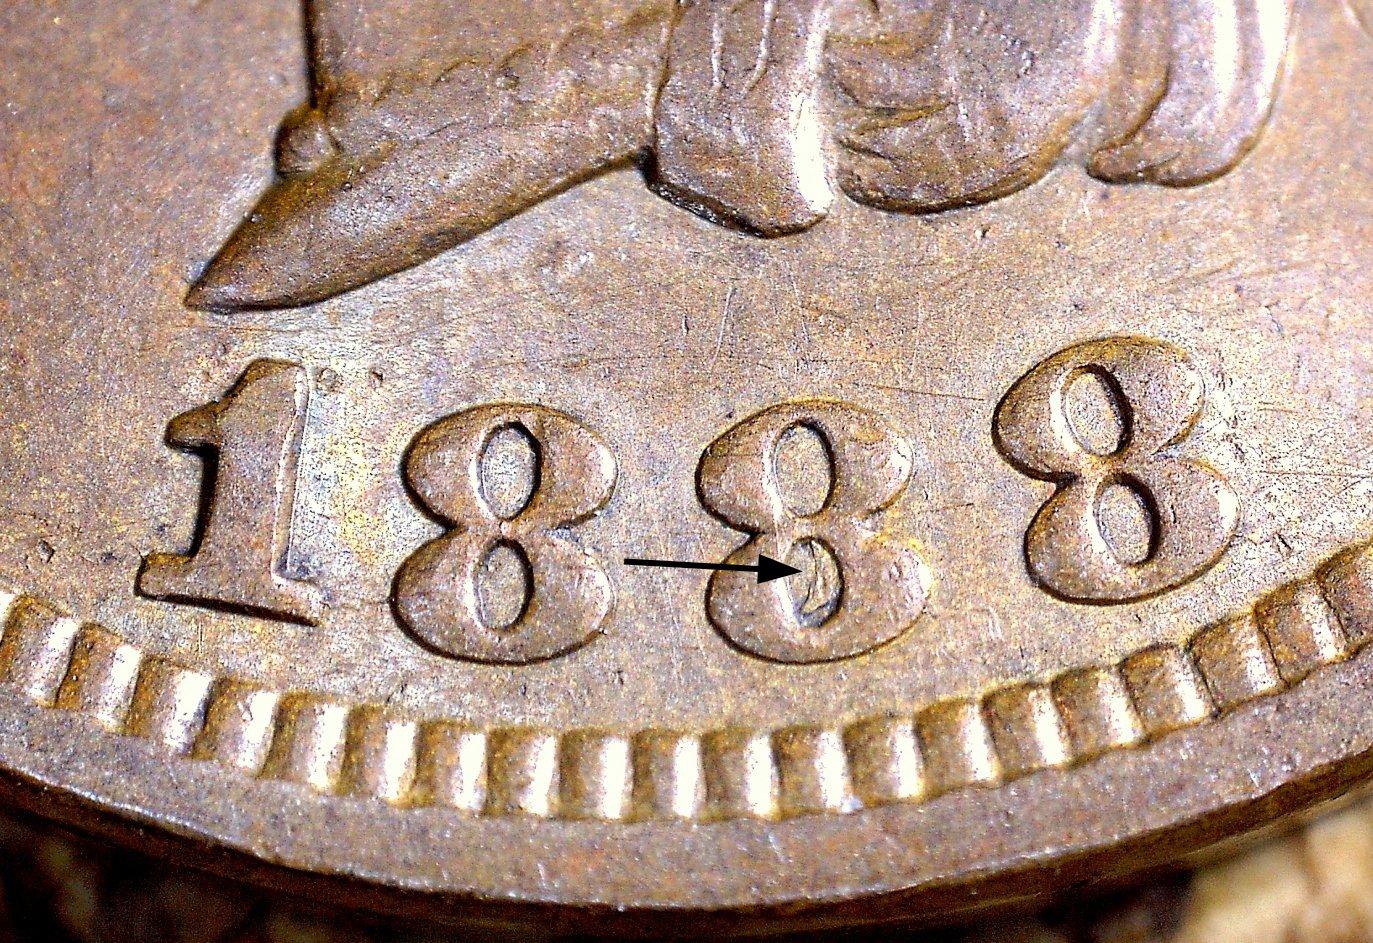 1888 RPD-015 - Indian Head Penny - Photo by David Killough